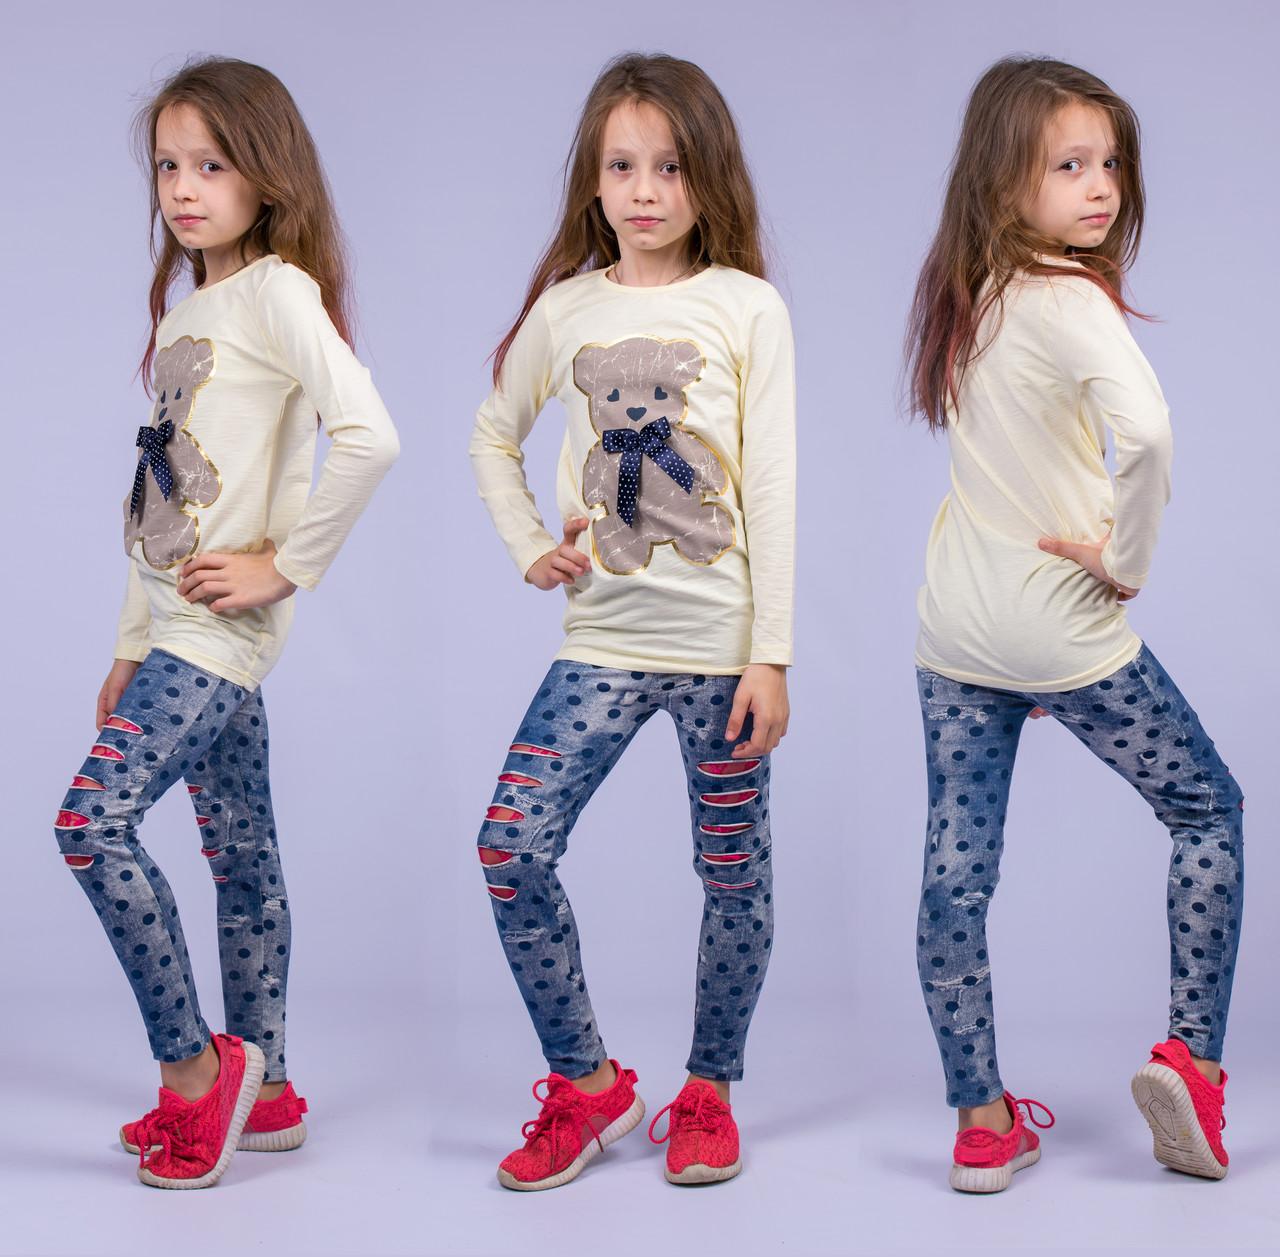 Туника на девочку Турция. Safari Kids 7531-3 6. Размер на 6 лет.